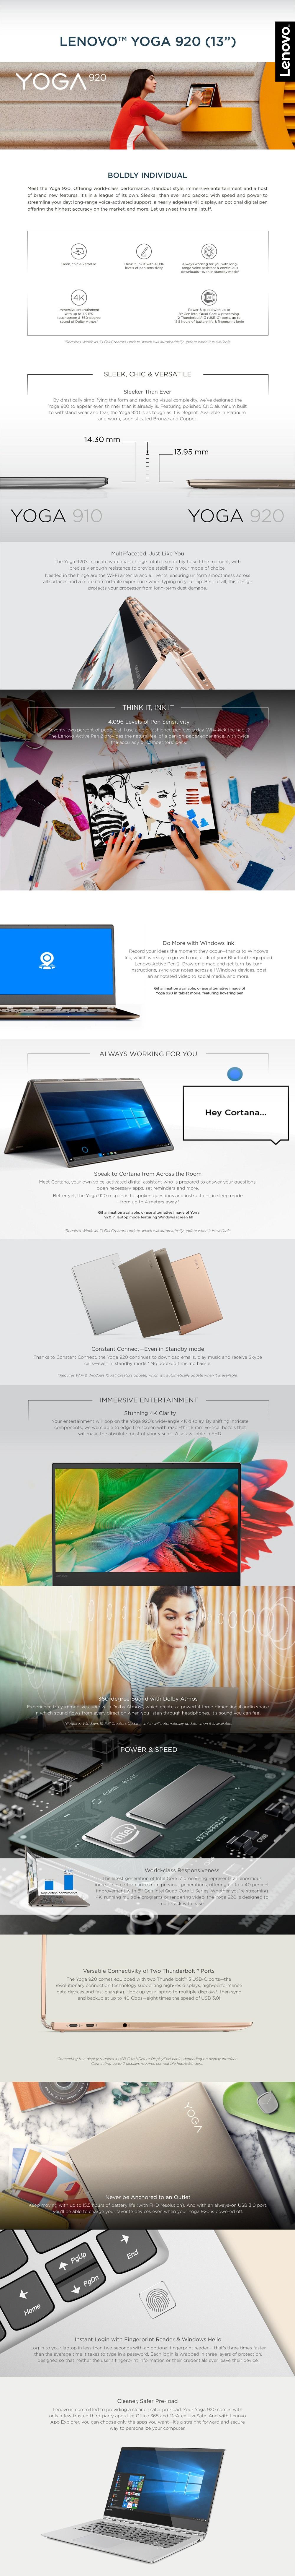 Lenovo YOGA 920 [Platinum] [Intel i7, 8GB RAM, 512GB SSD]